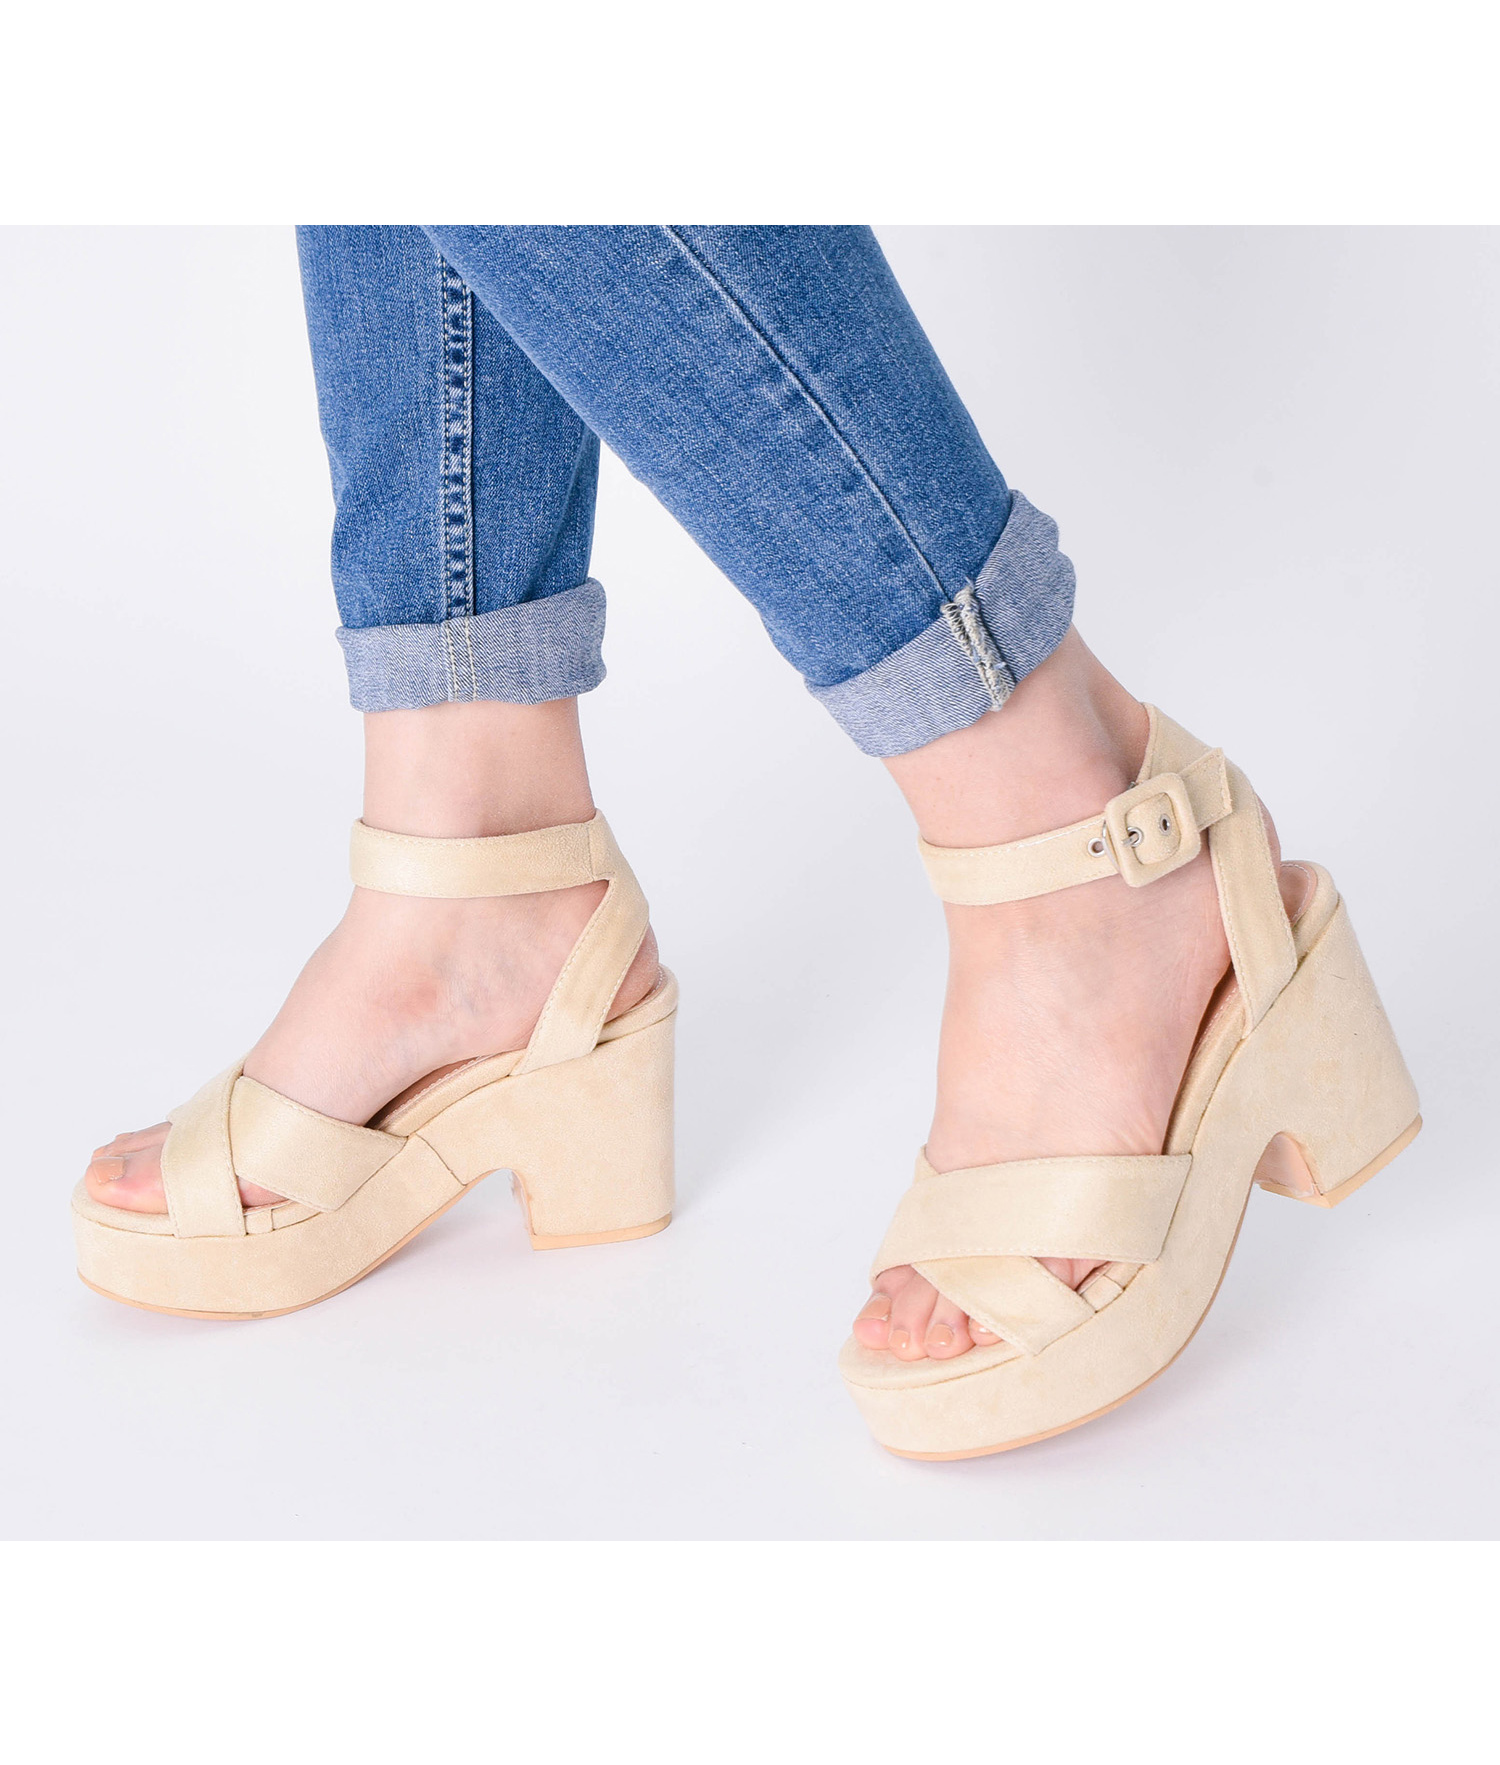 47475e11e401 AnnaKastle Womens Vegan Suede Ankle Strap Platform Sandals Beige